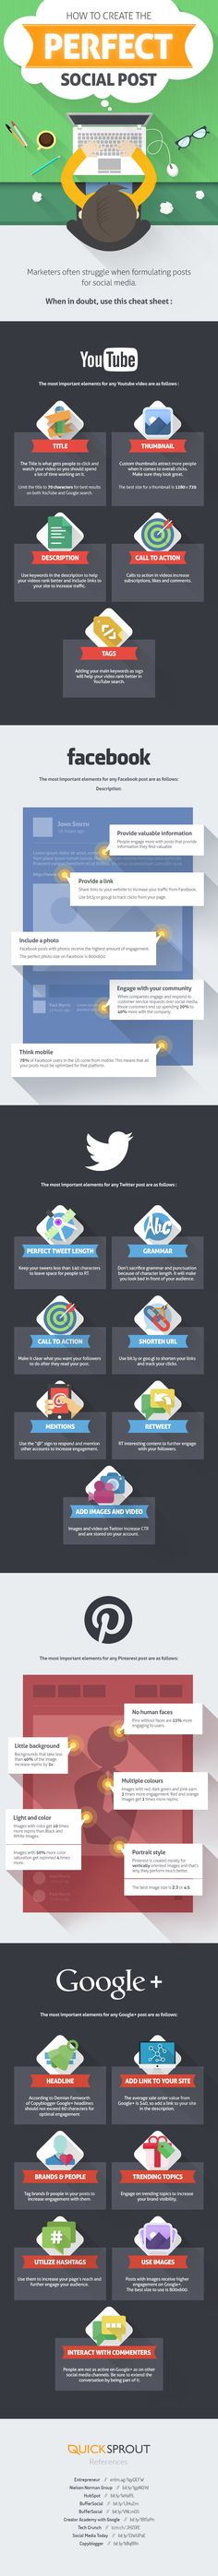 So erstellen Sie den perfekten #SocialMedia Post How to create perfekt Social Post